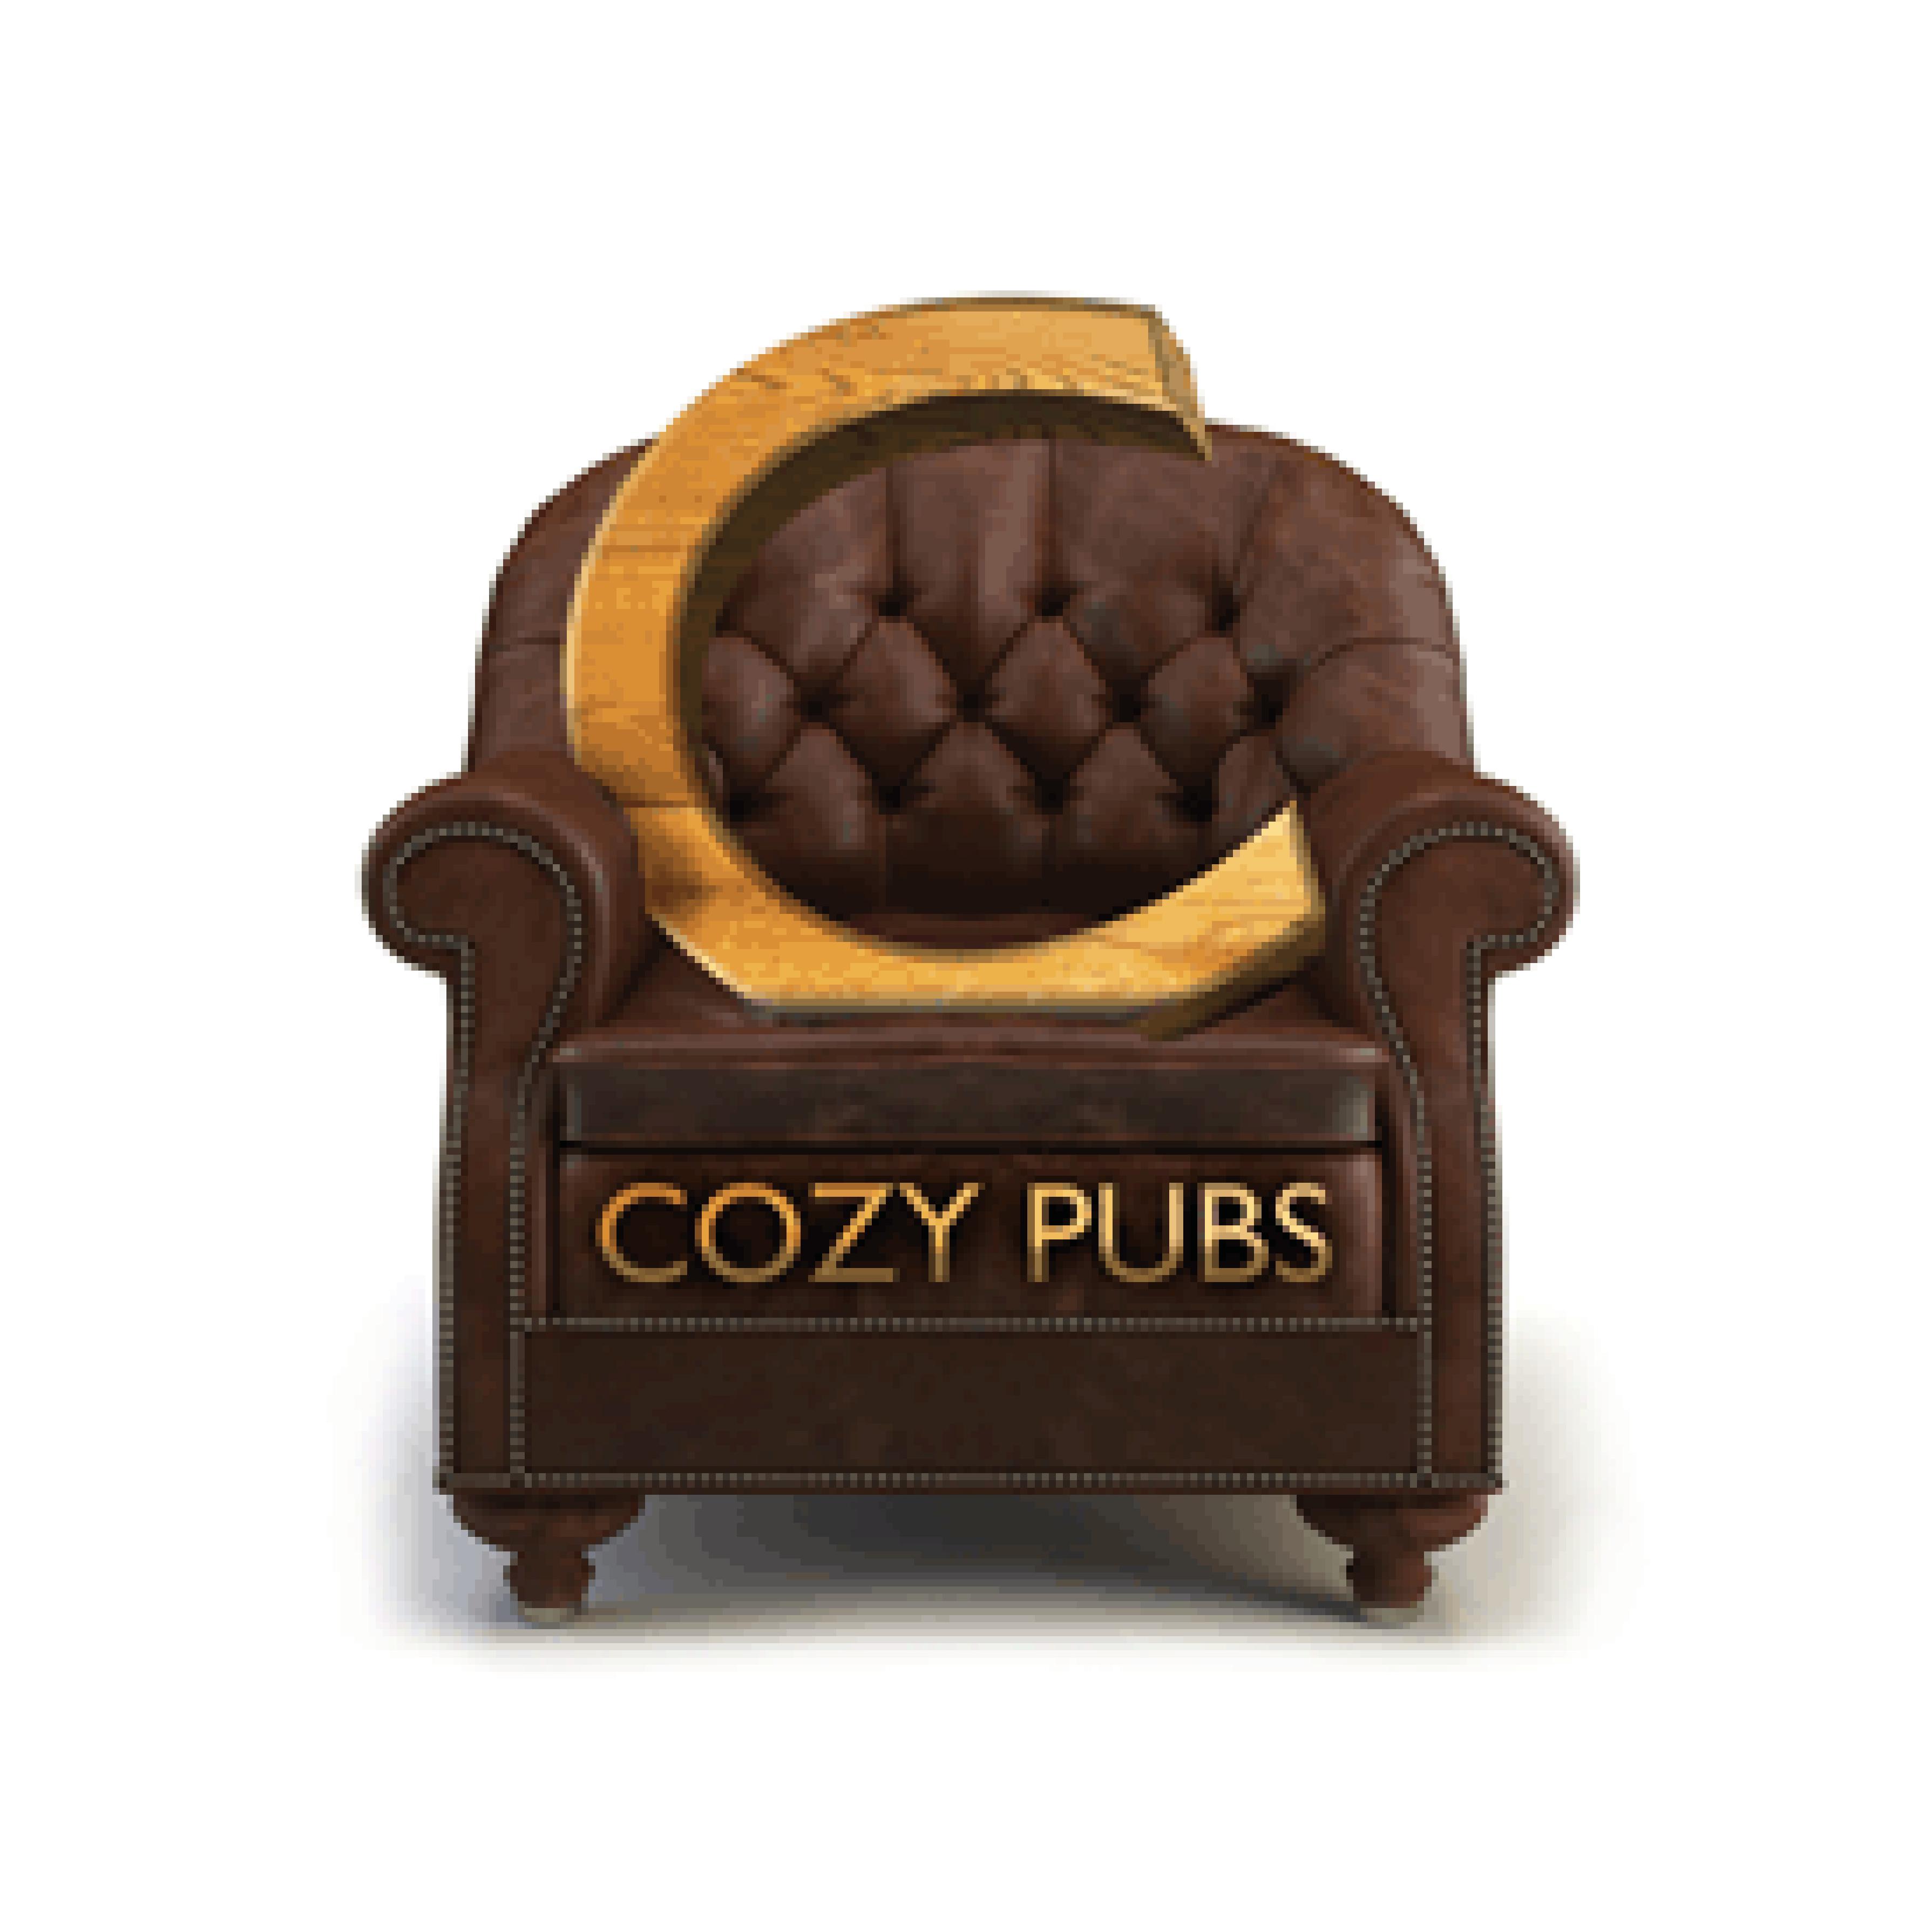 Cozy Pubs